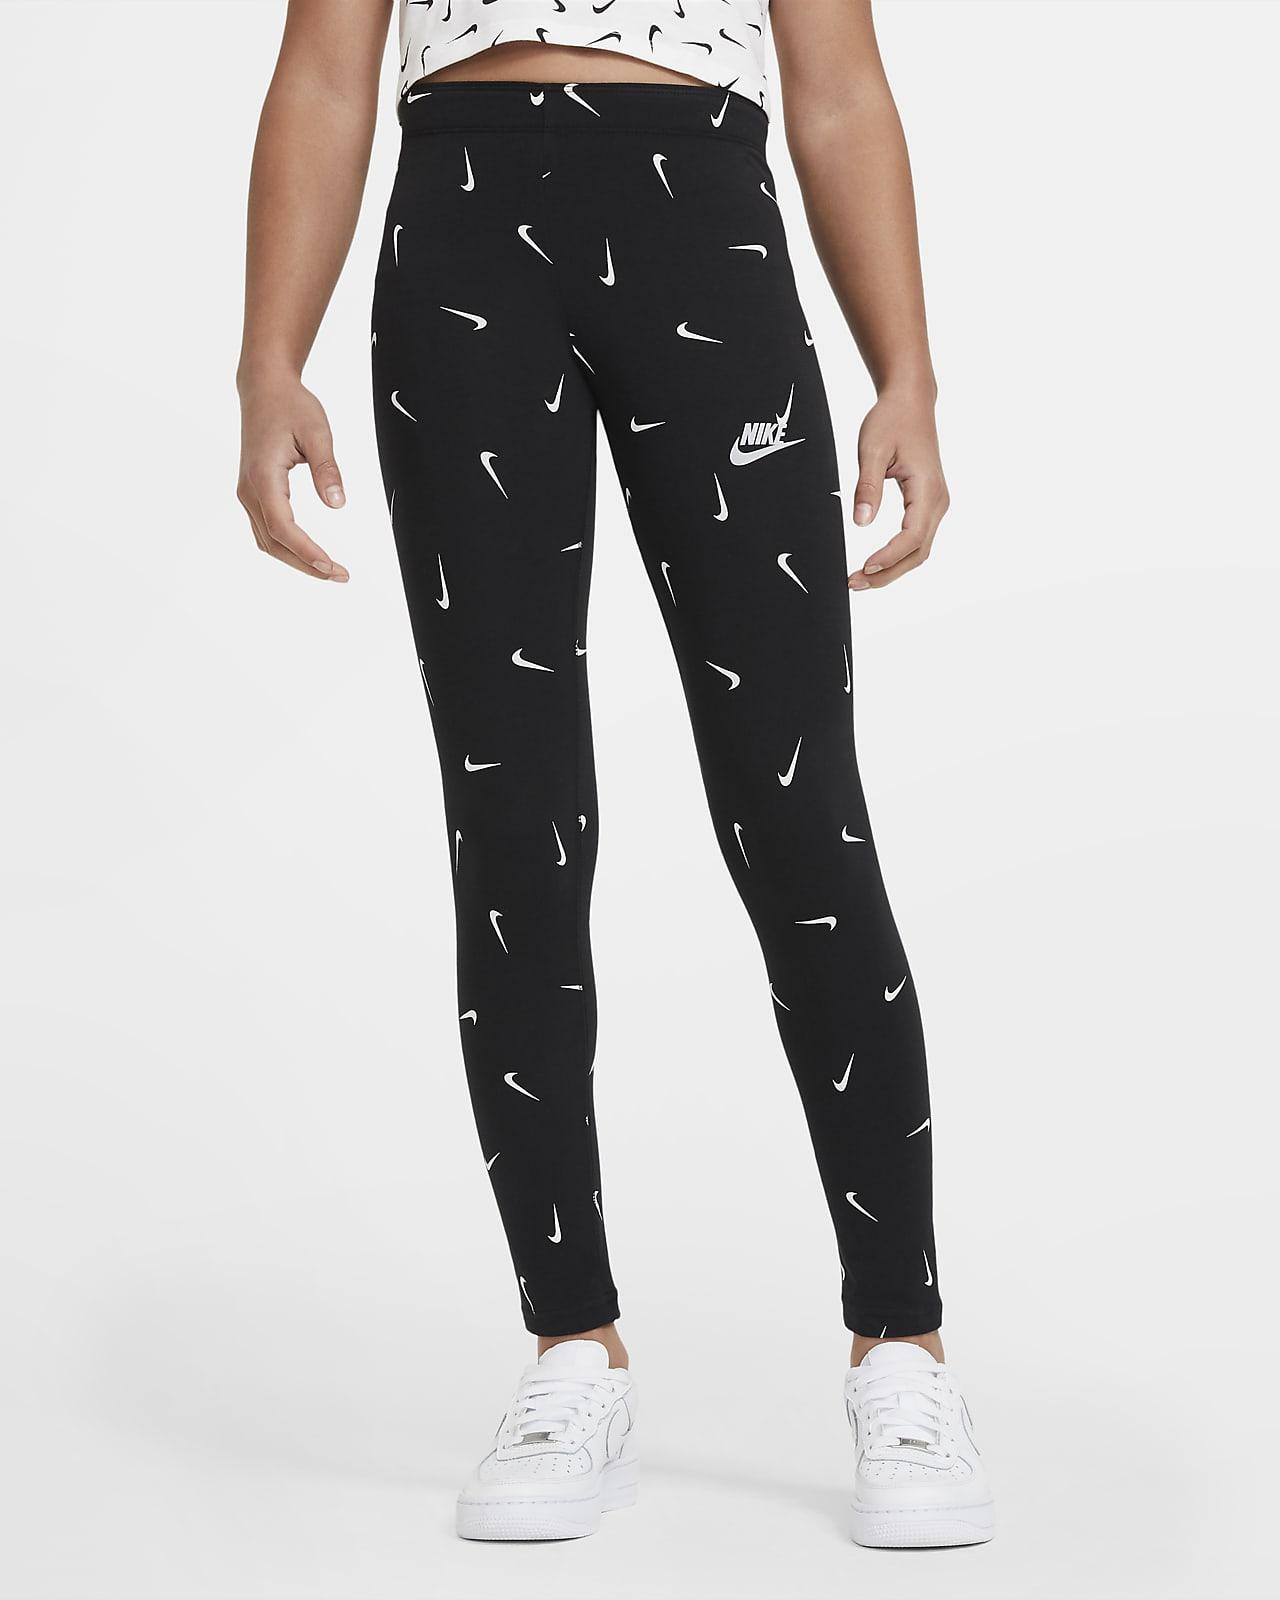 Nike Sportswear Big Kids' (Girls') Printed Leggings